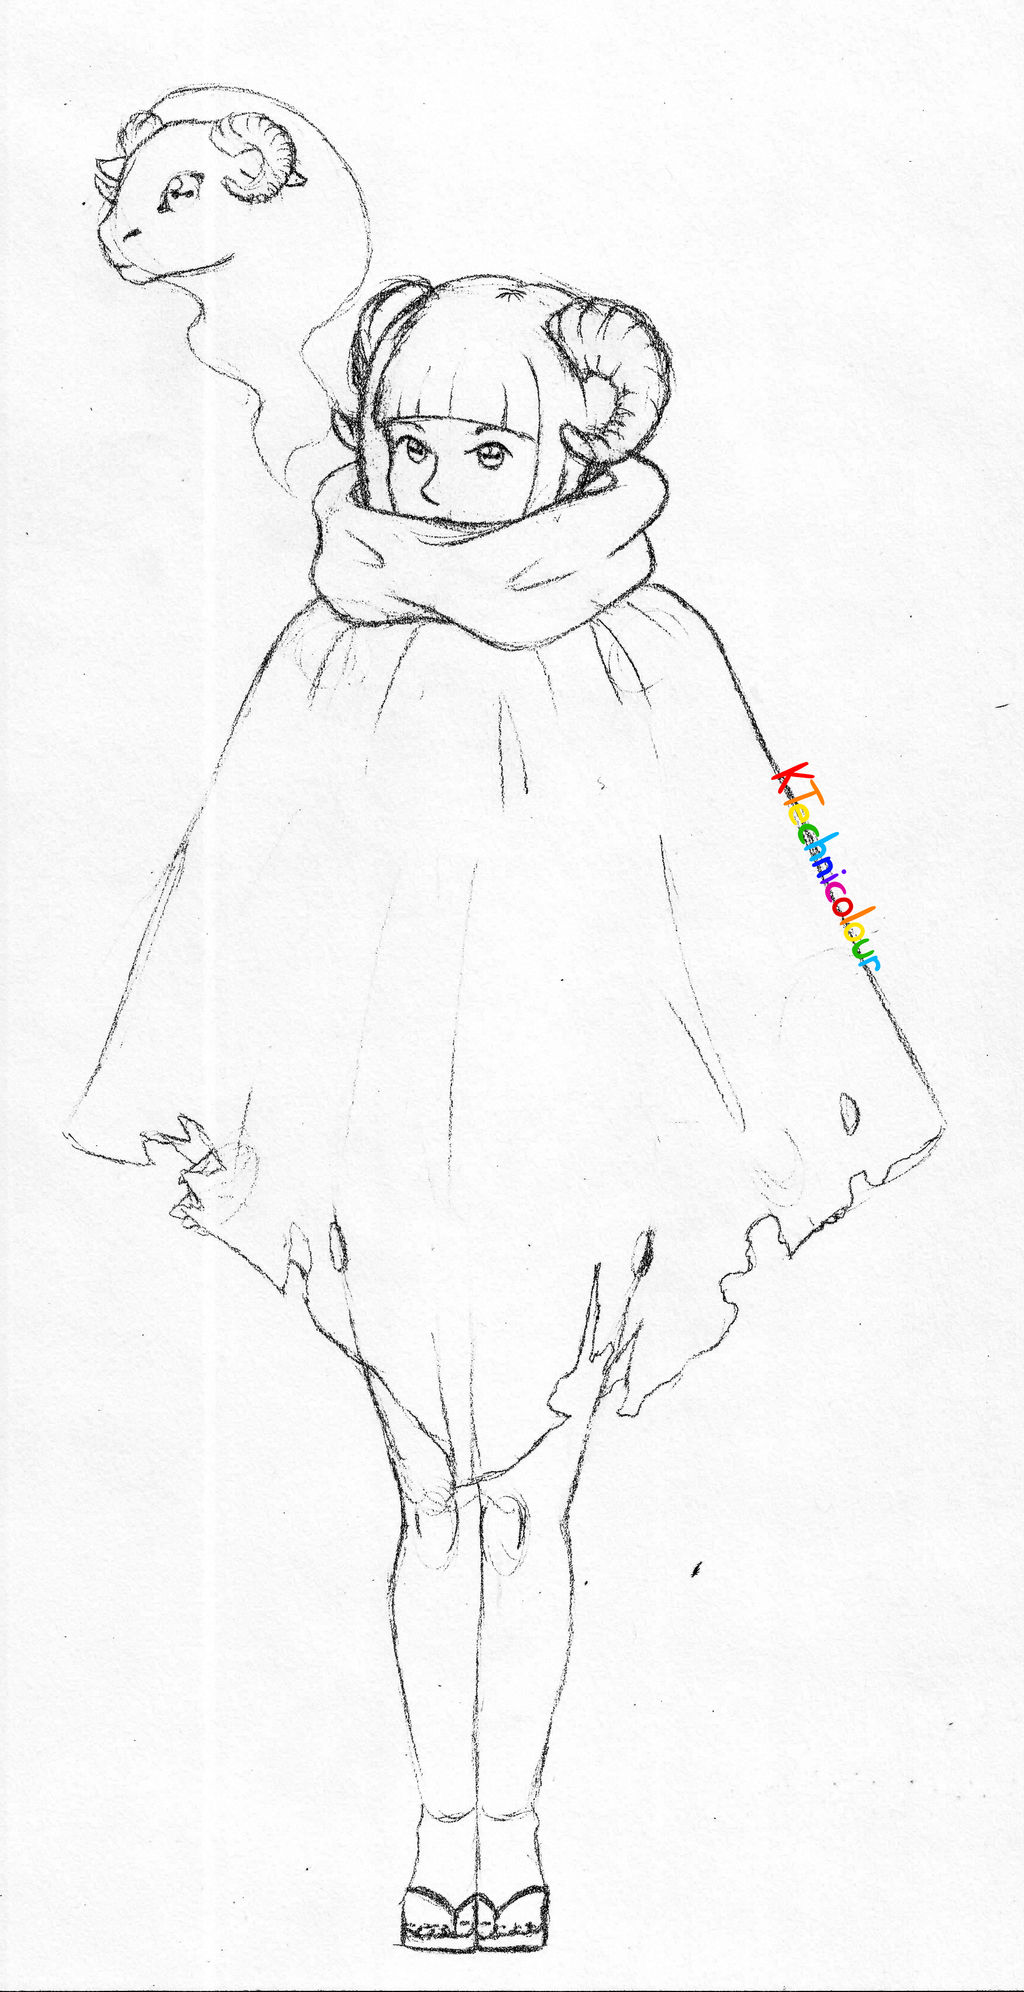 SheepGirl Sketch by KTechnicolour